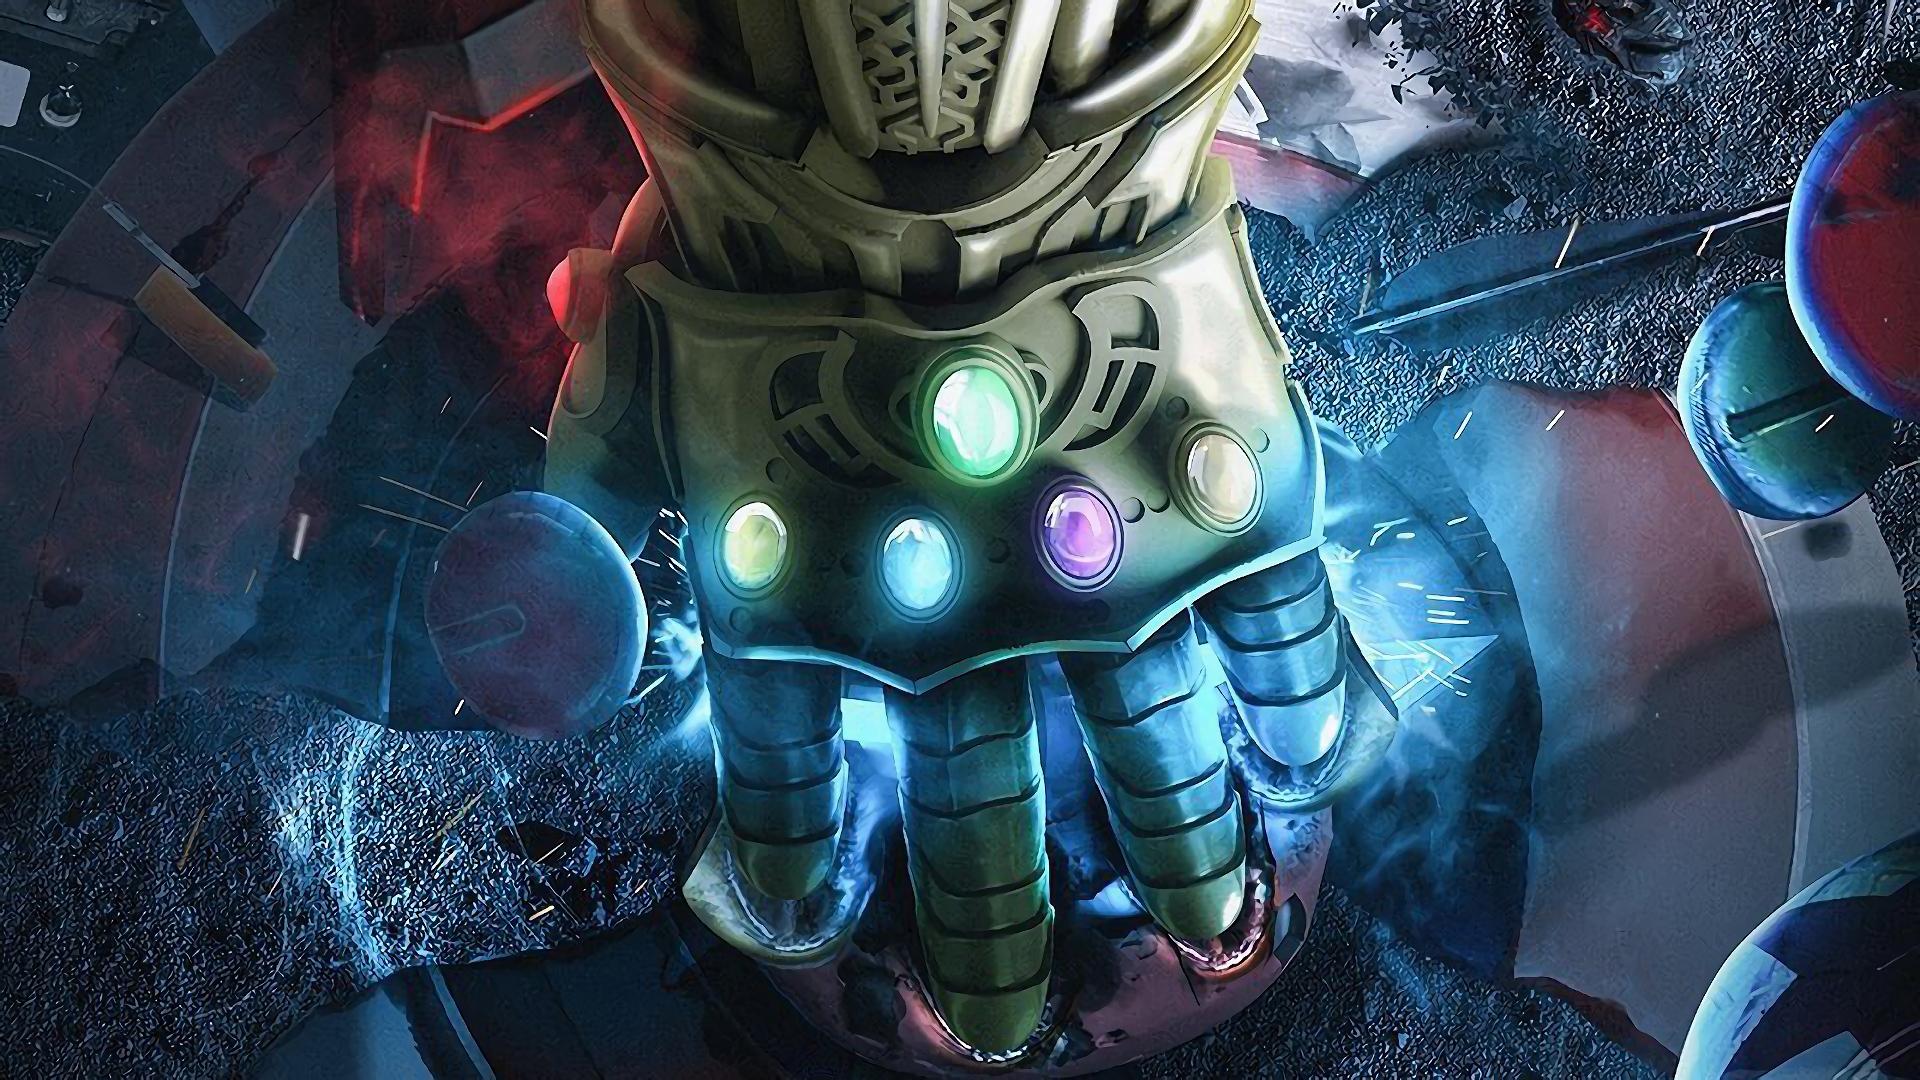 Thanos Wallpaper Avengers | www.pixshark.com - Images ...